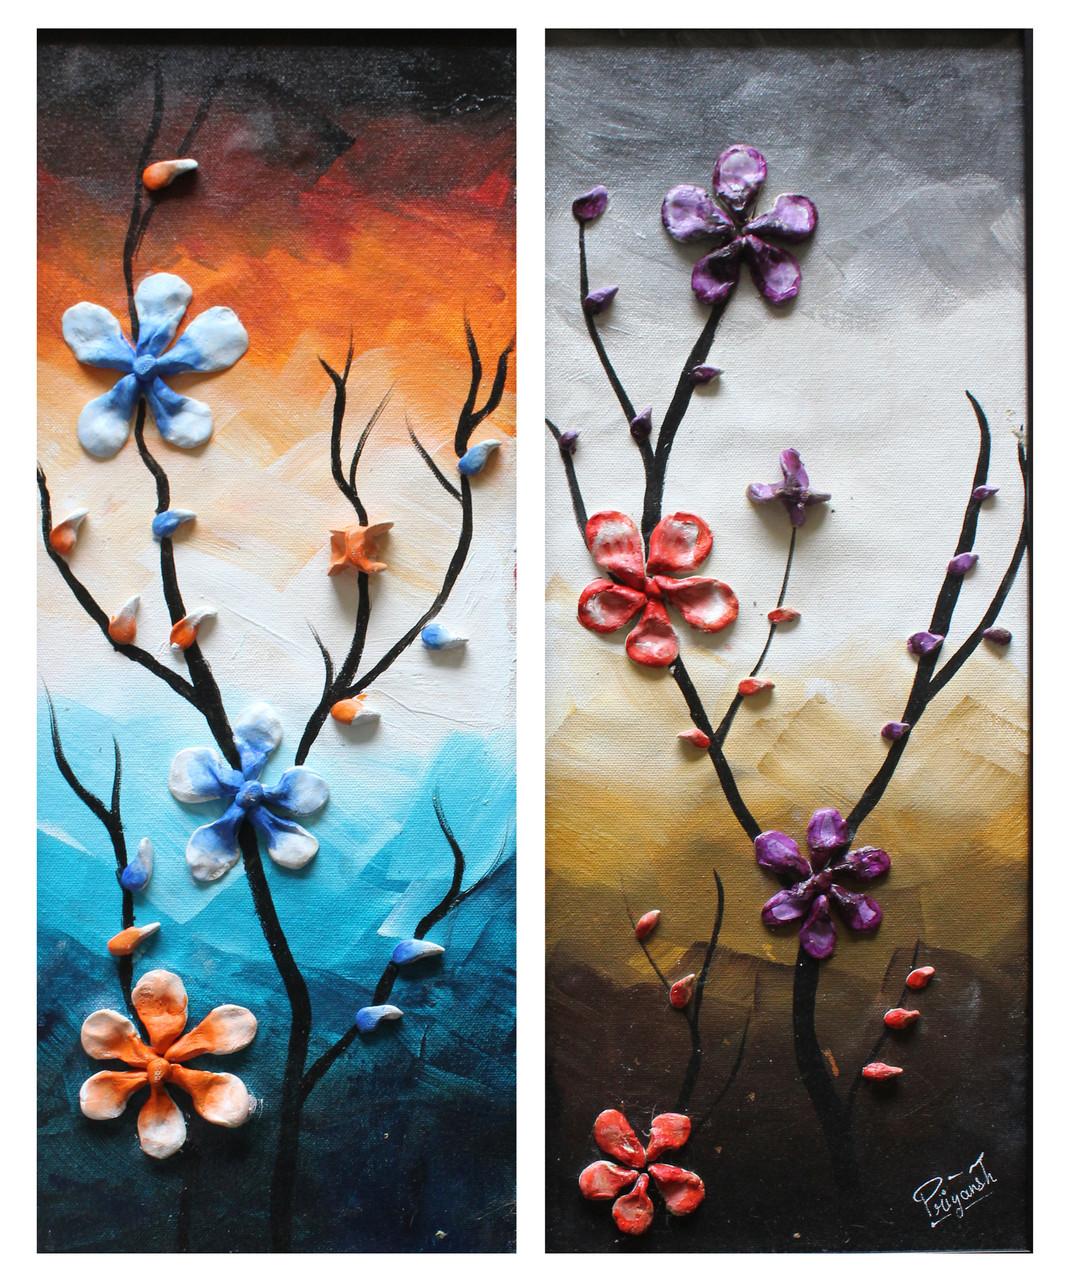 Buy 3D Flowers Handmade Painting By Priyansh Thakkar. Code